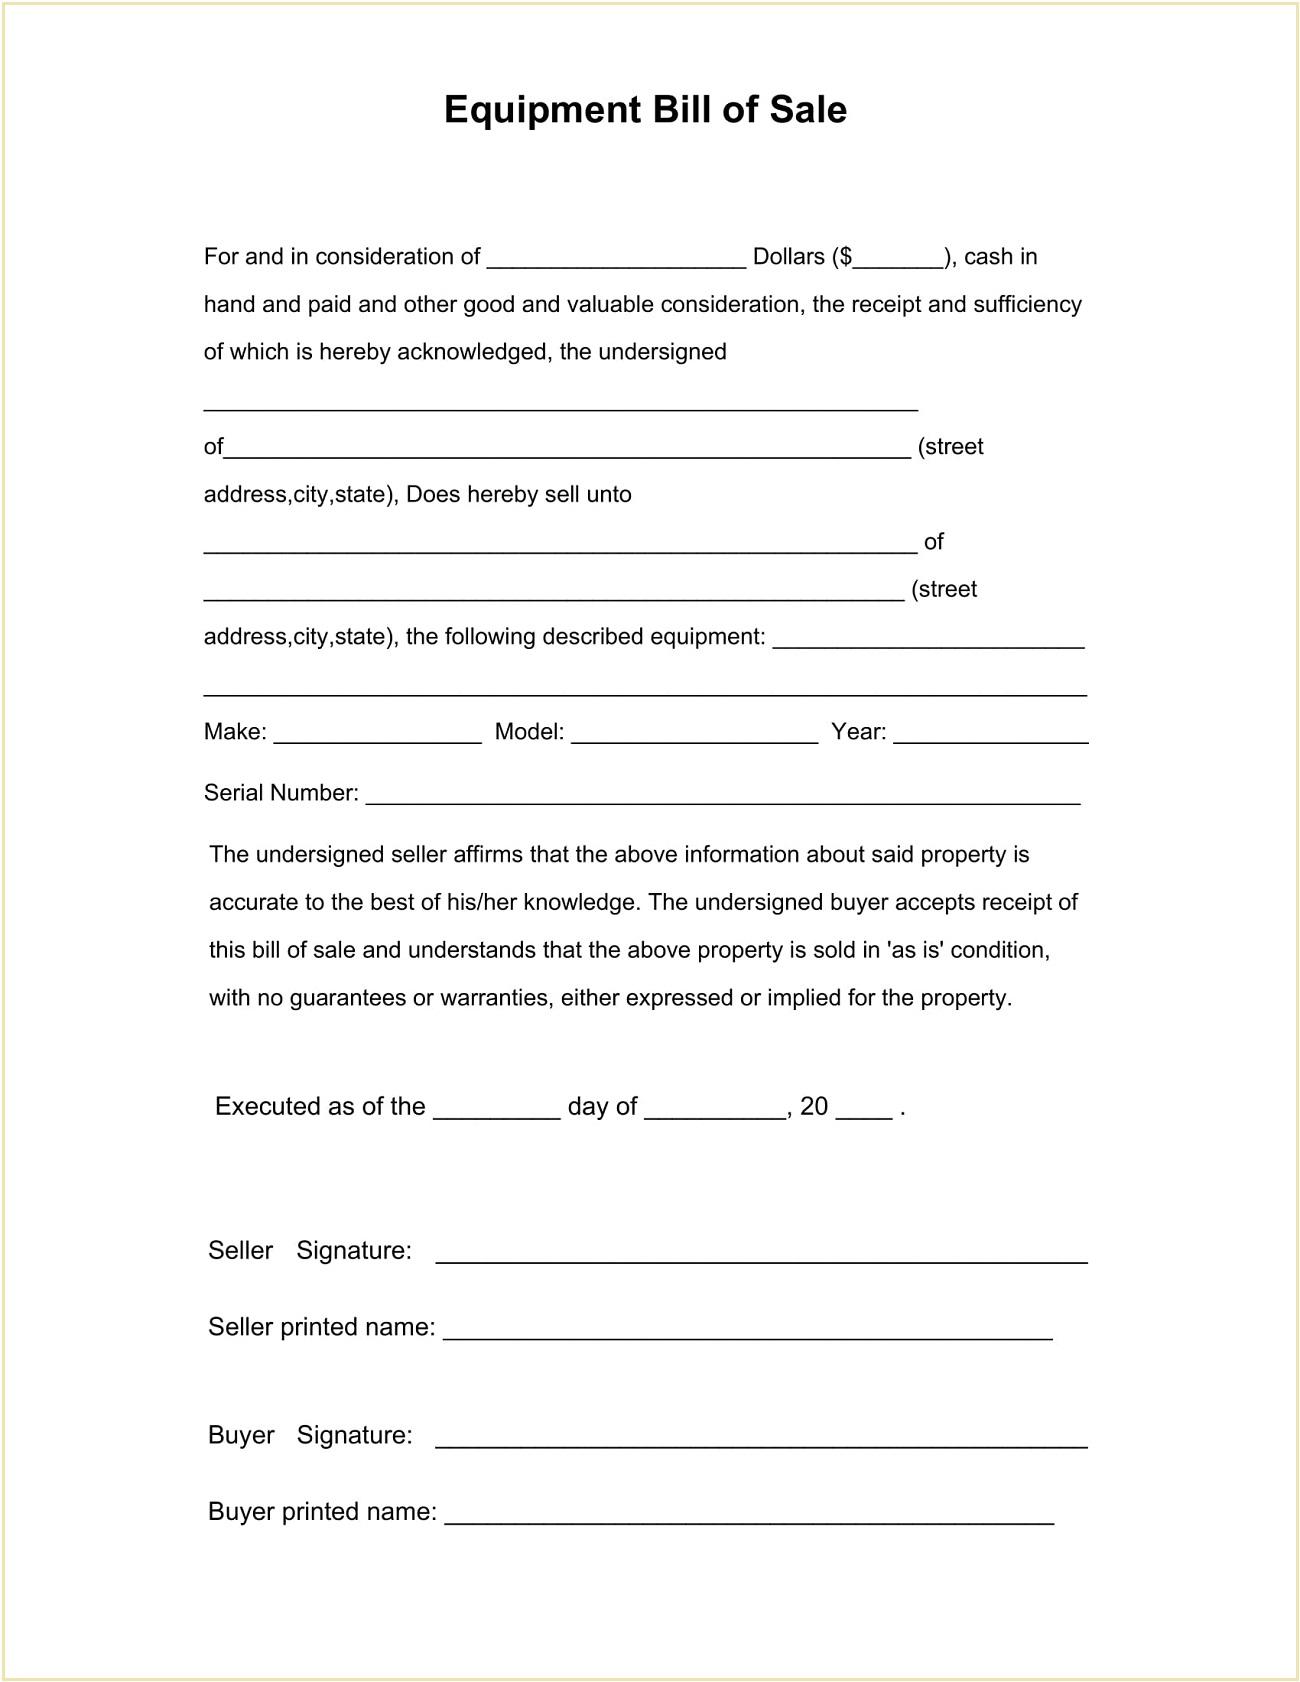 Equipment Bill of Sale Form Template PDF